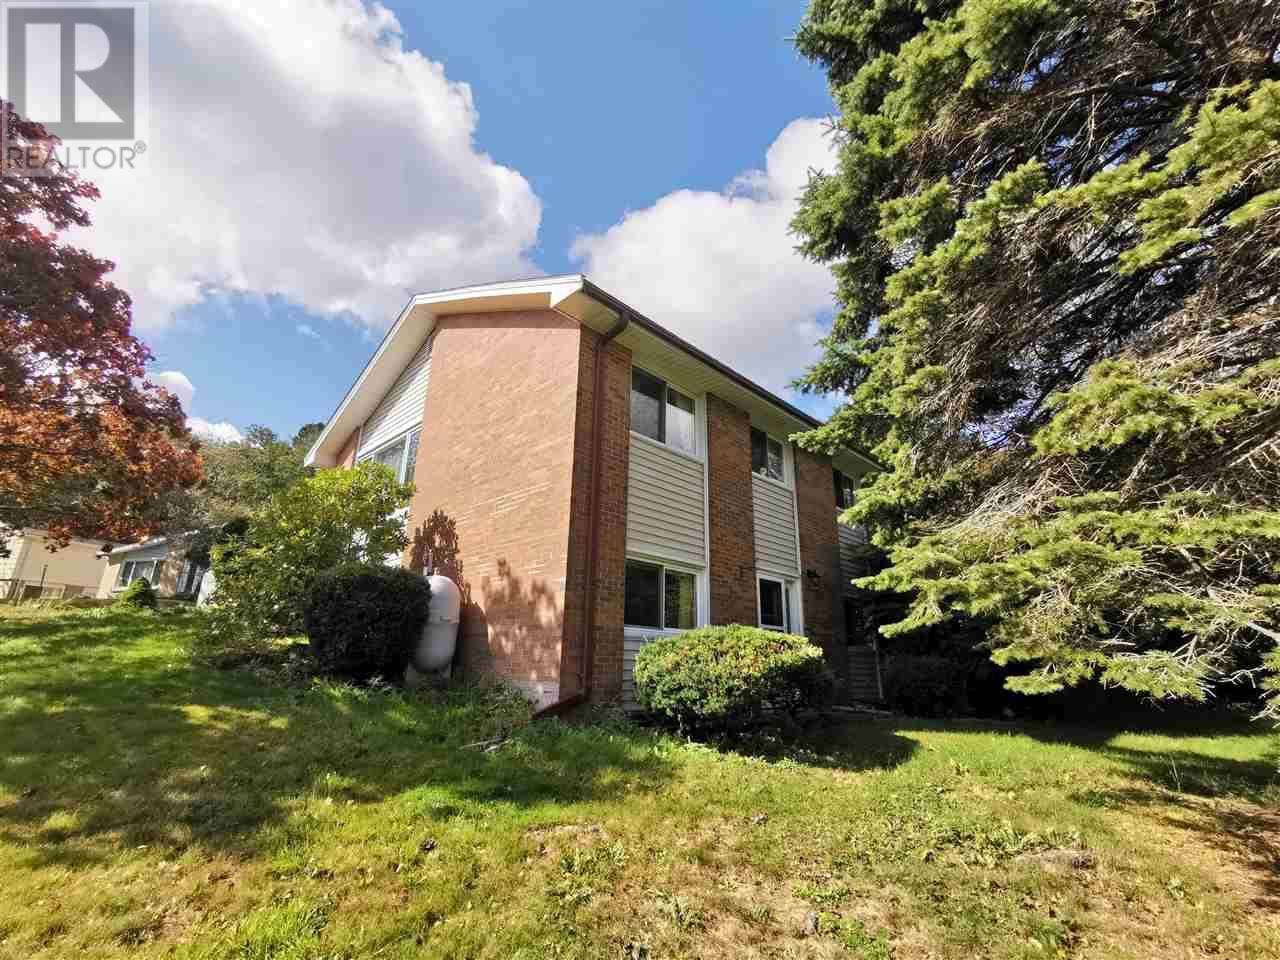 House for sale at 1 Laurentide Dr Clayton Park Nova Scotia - MLS: 202000718